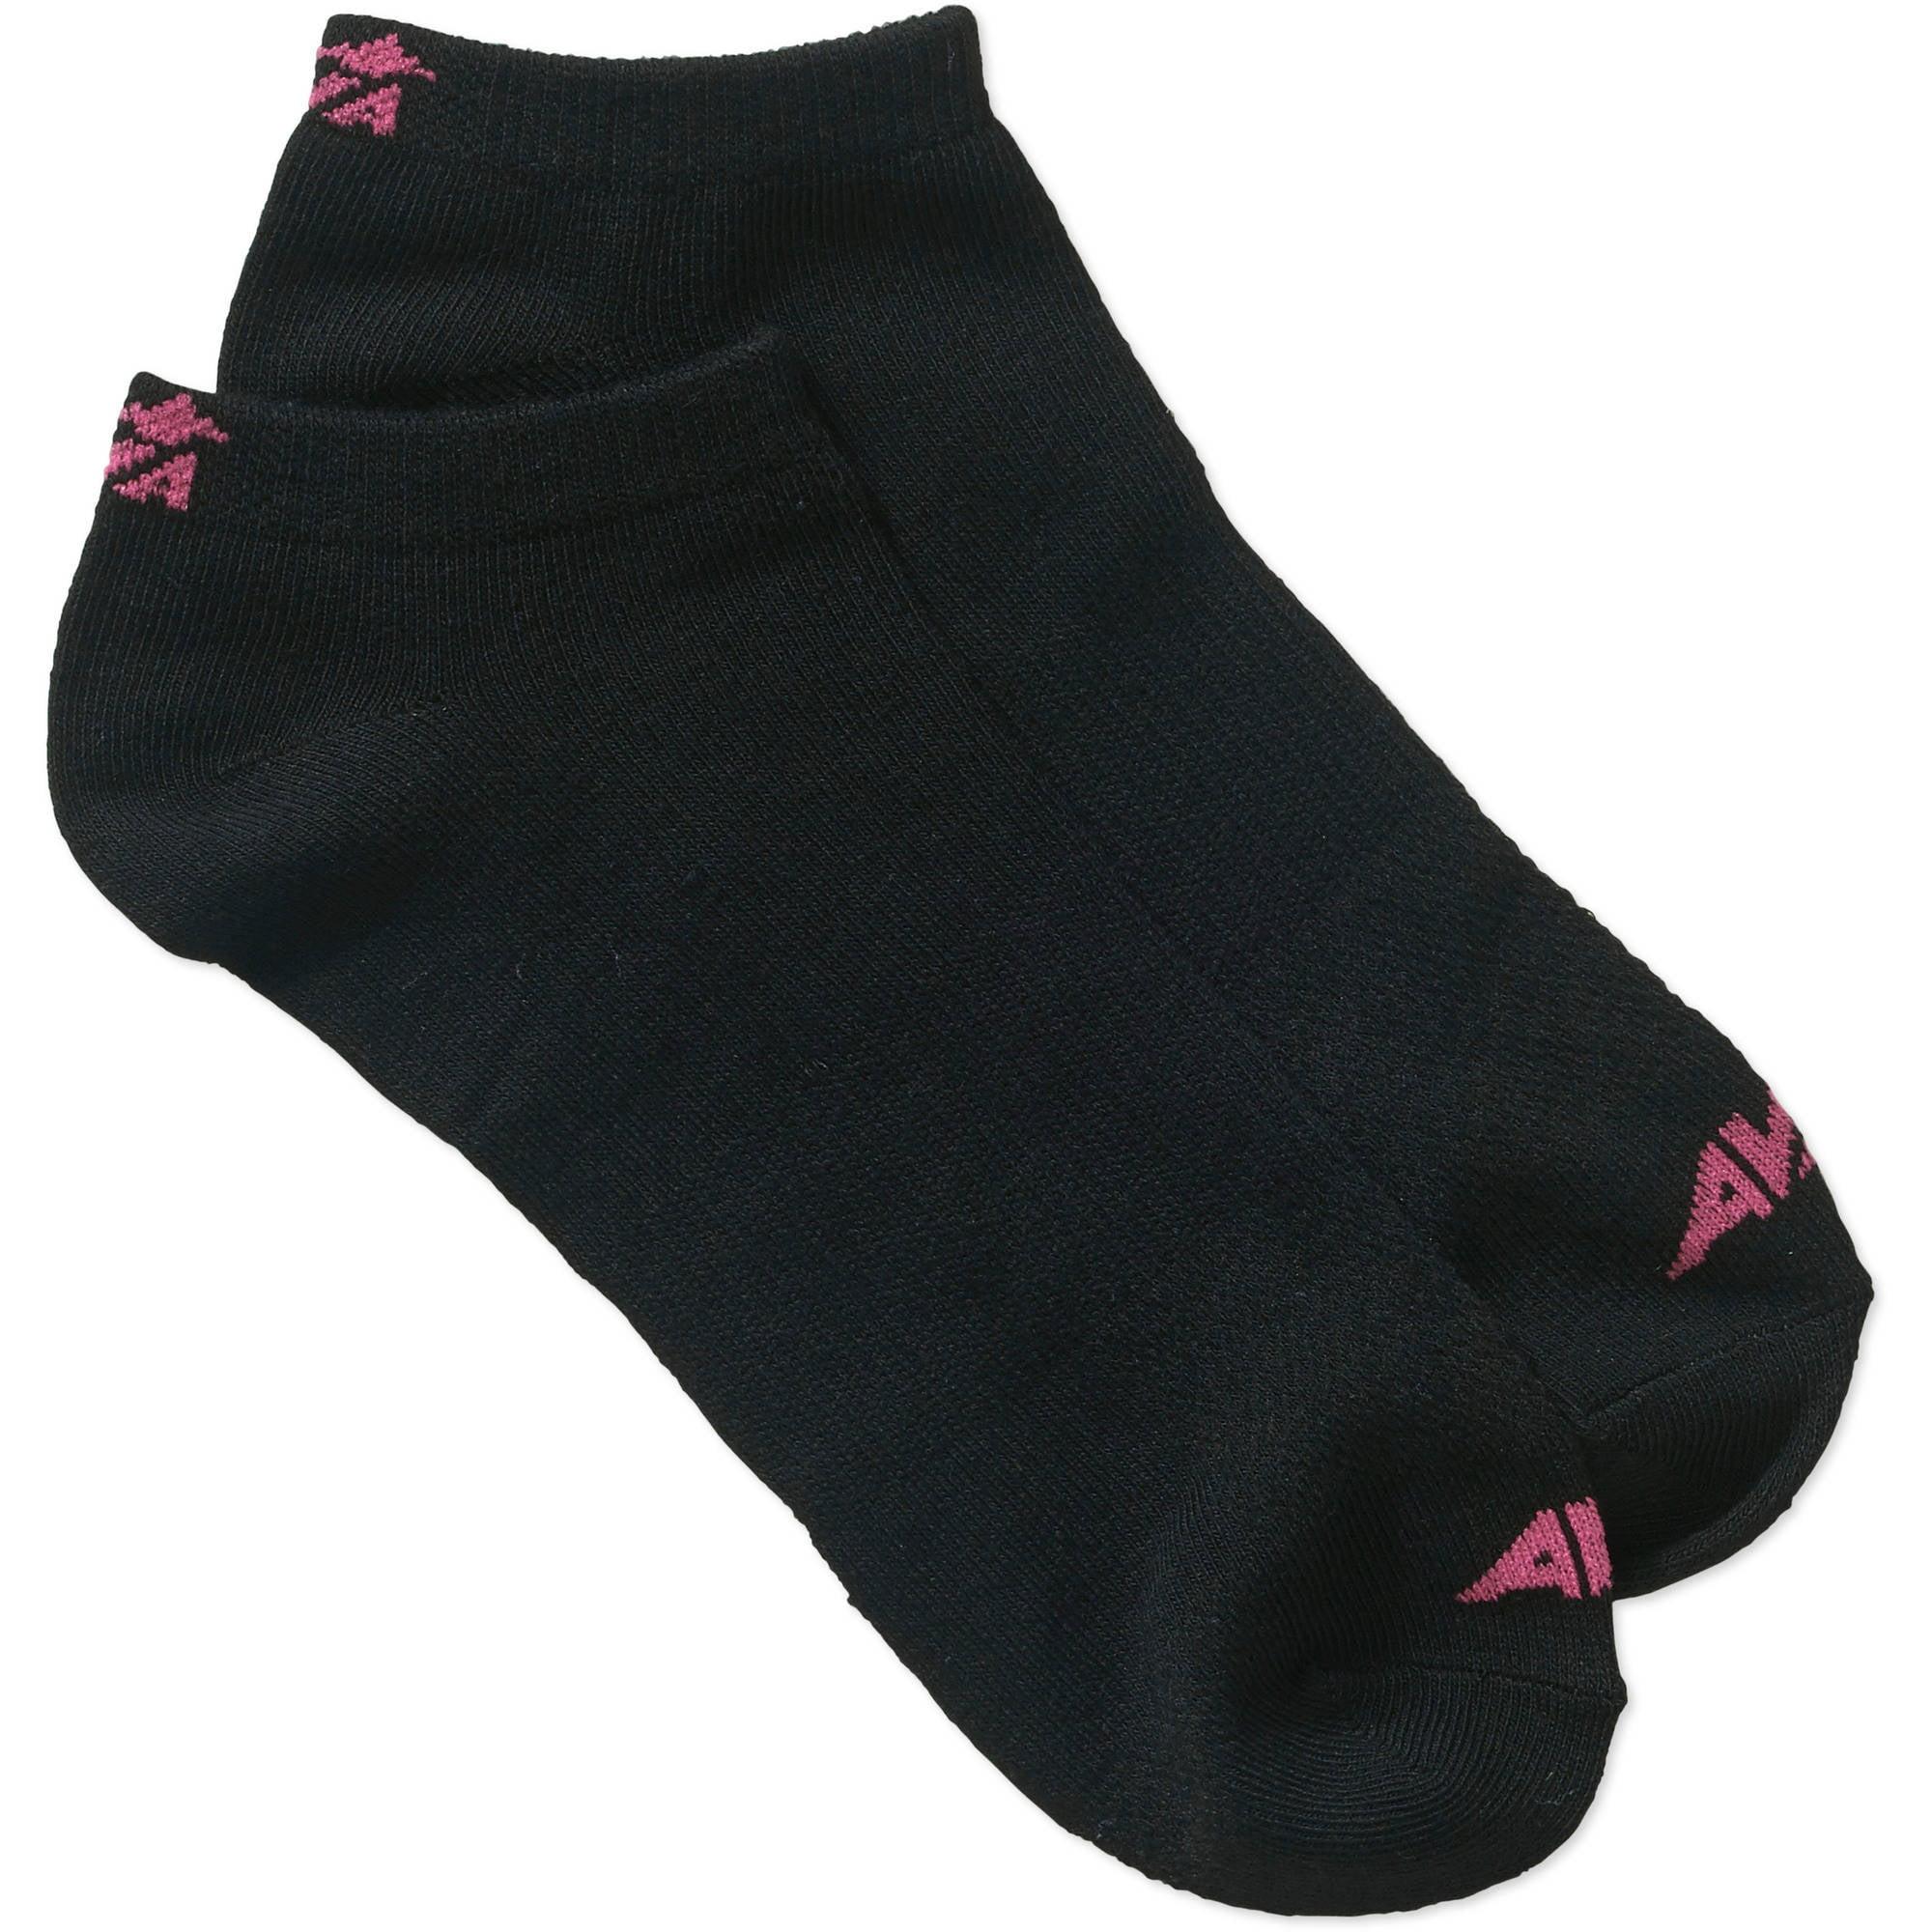 Avia Ladies Performance Liner Low Cut Socks - 12 Pack